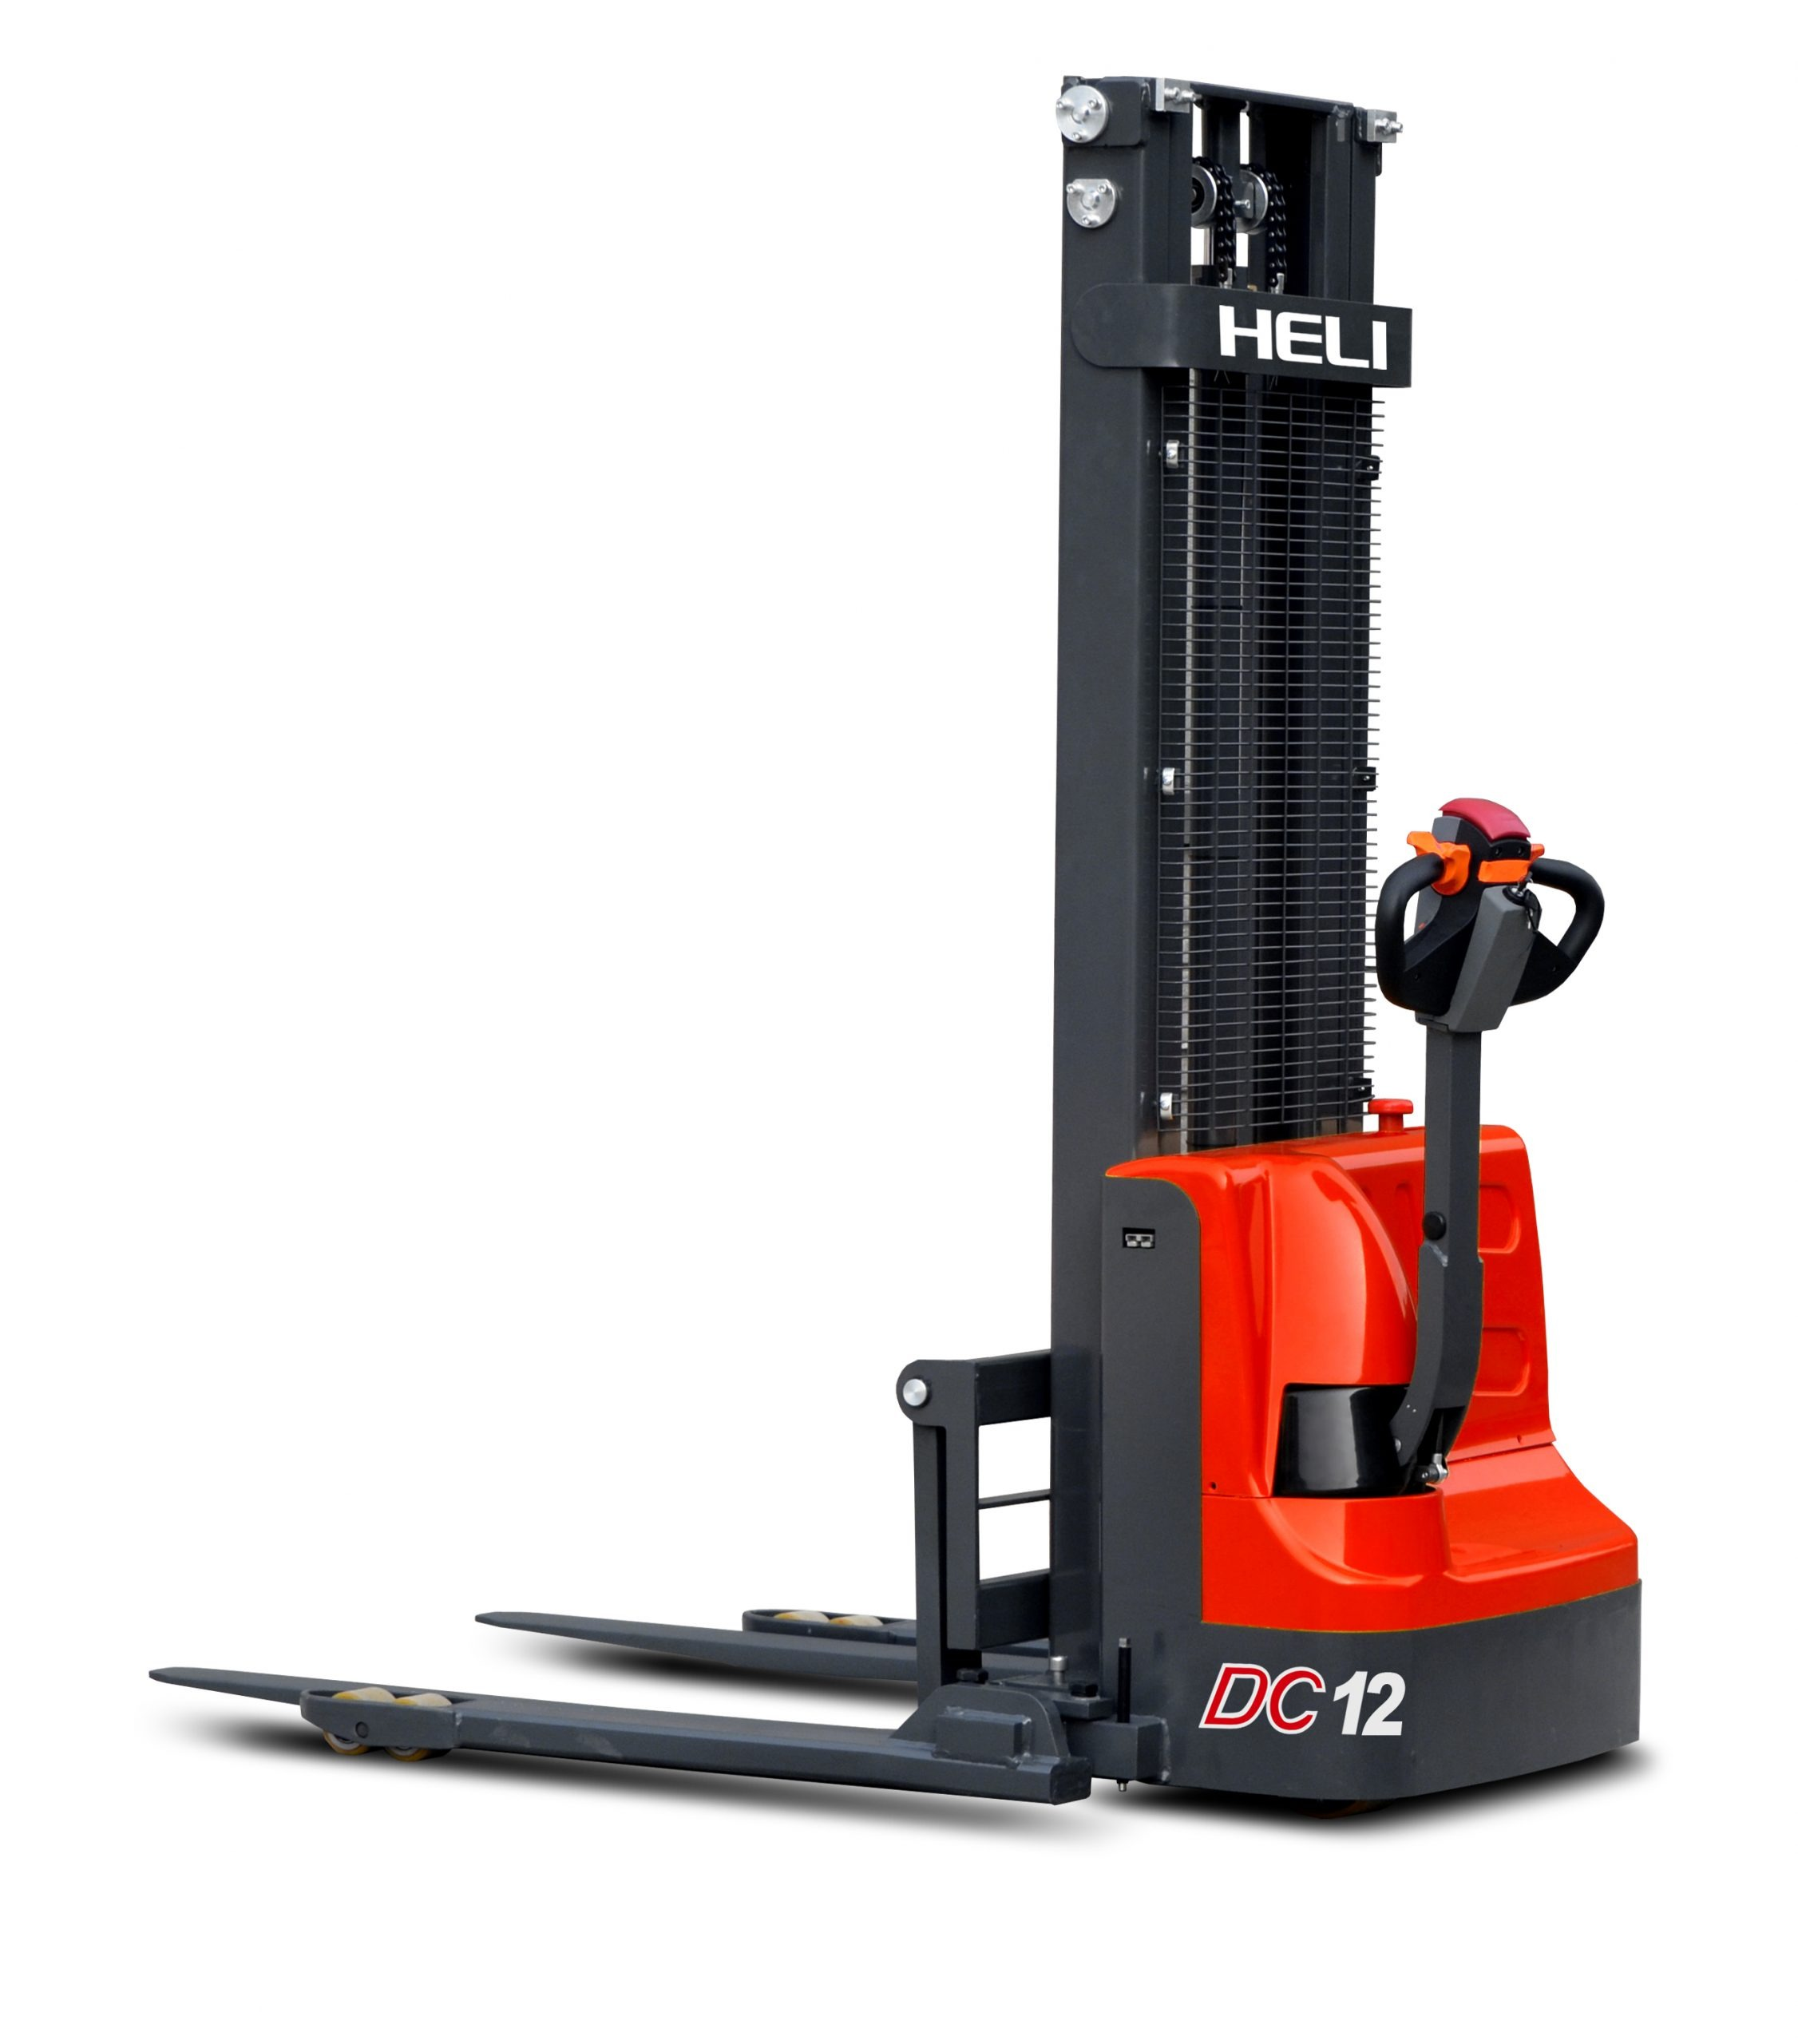 CDD12J-K Electric Stacker - Straddle - 2,650 lbs